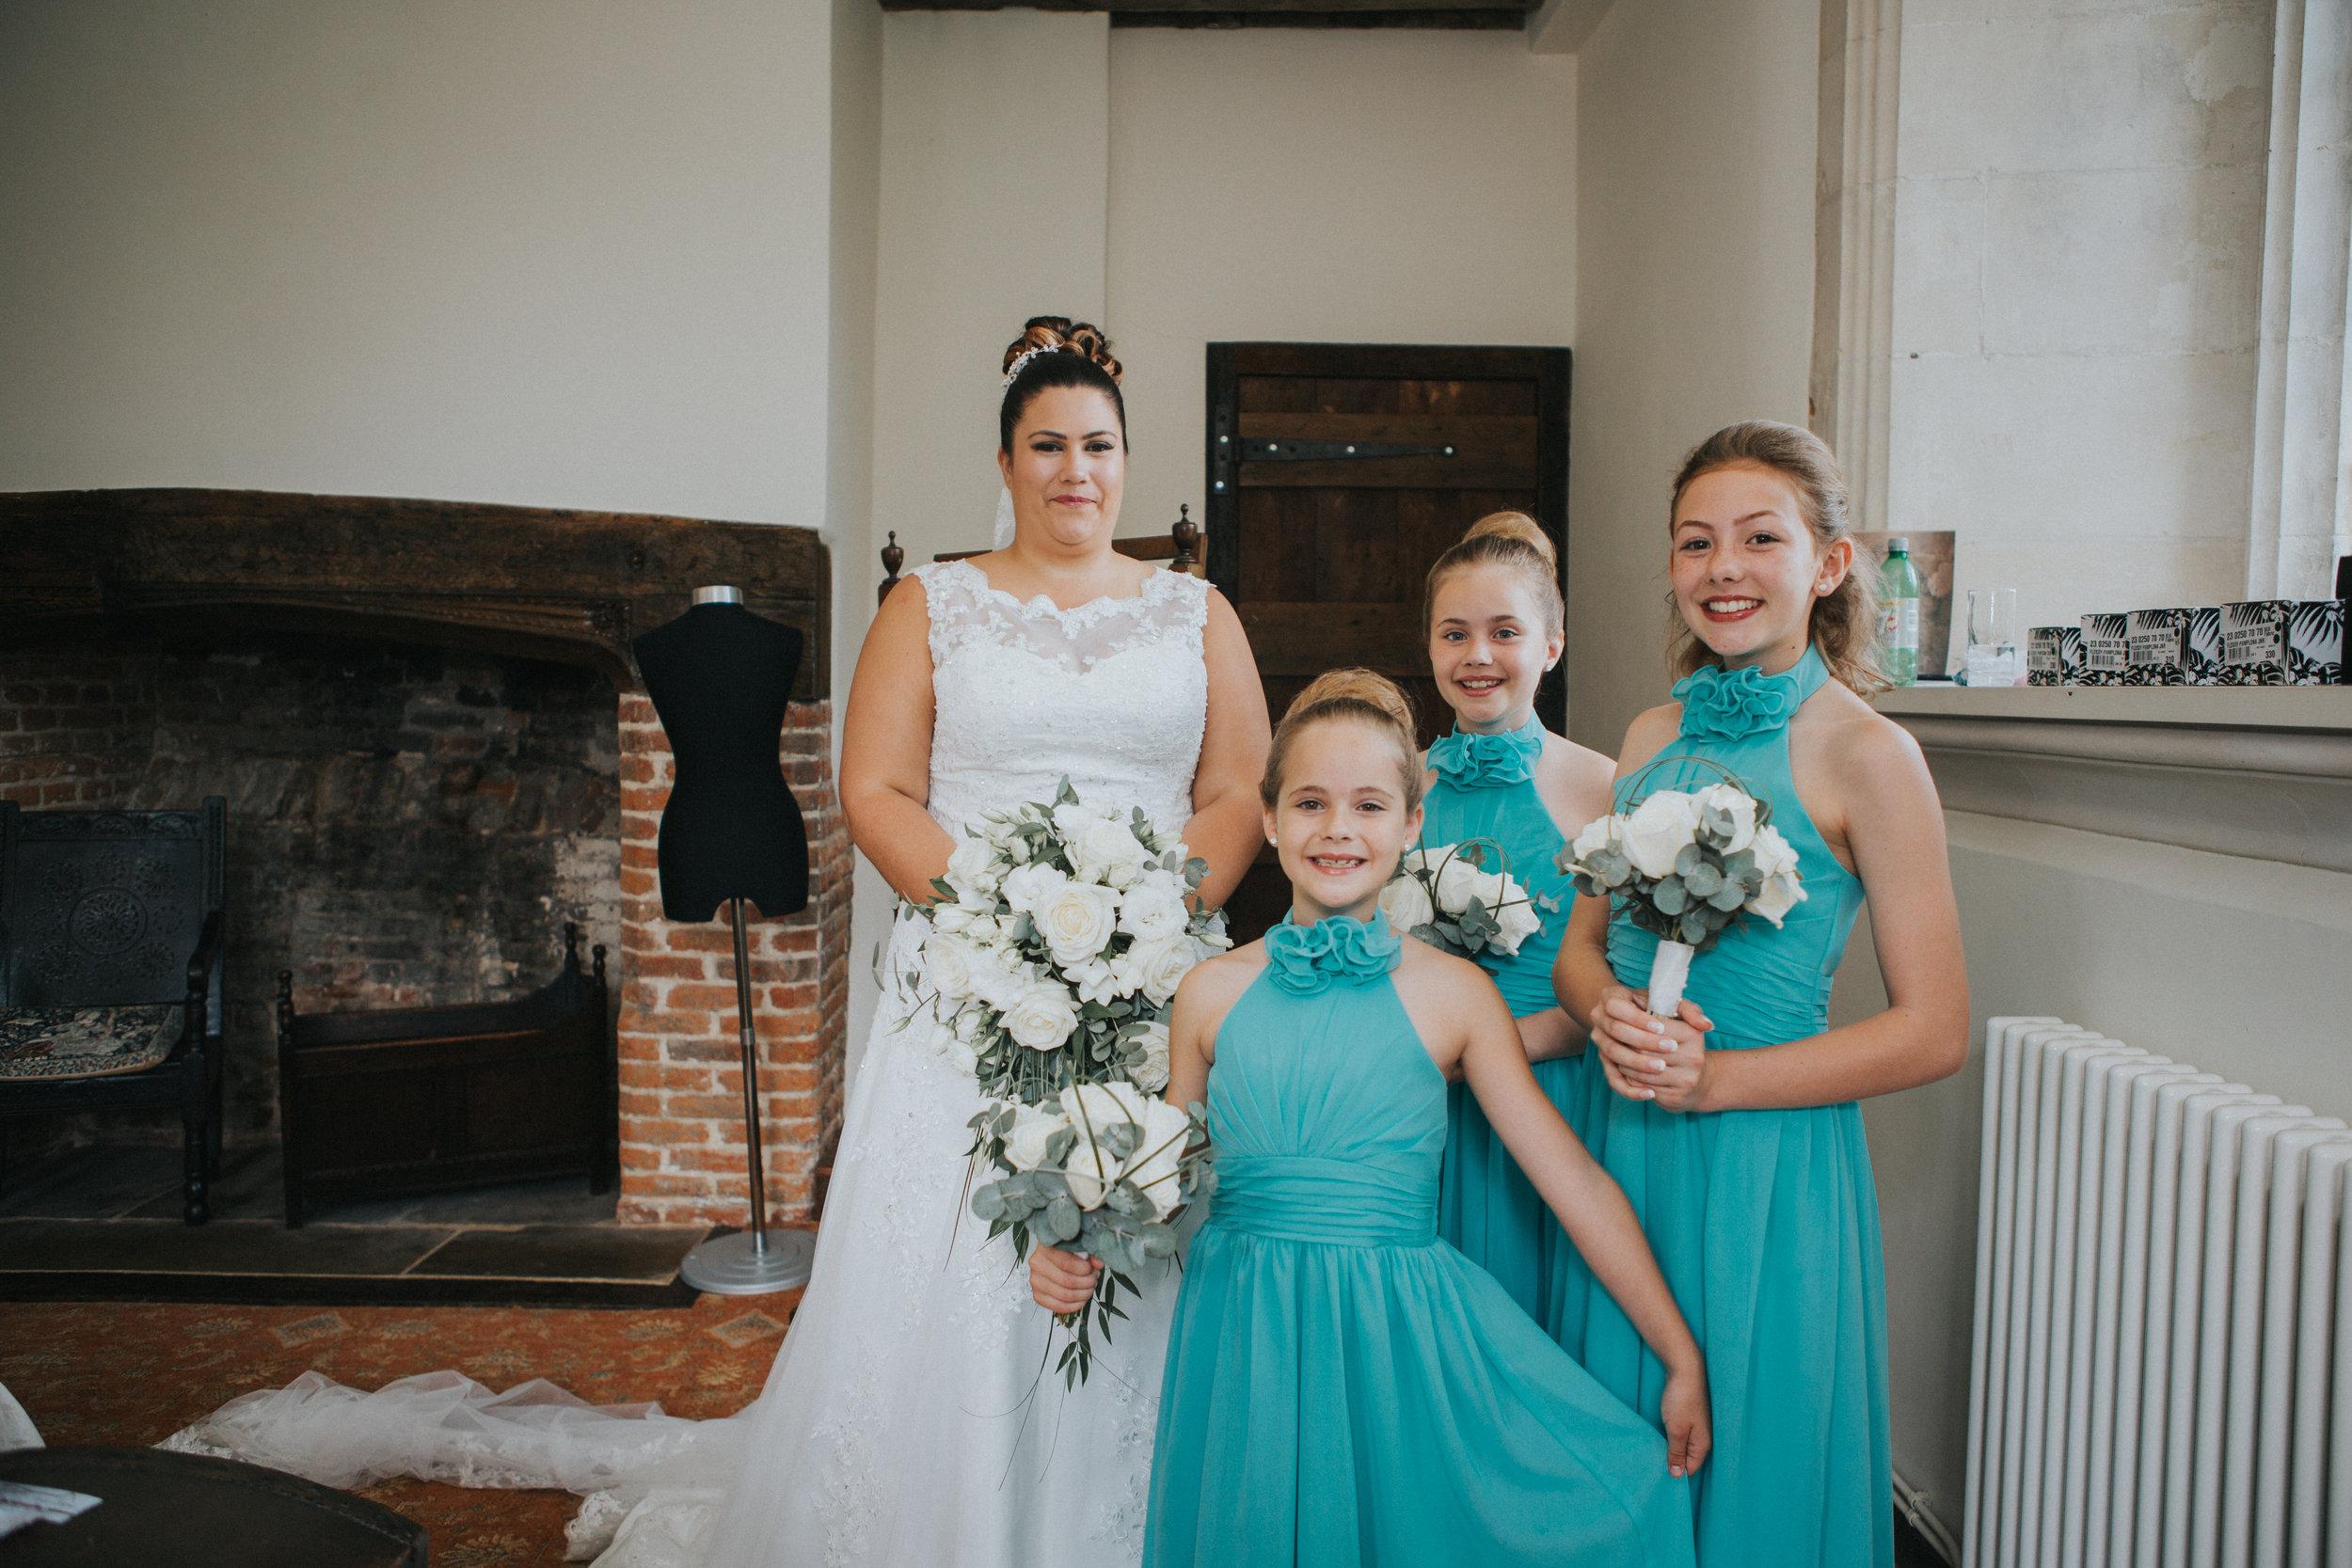 westenhangar-castle-kent-london-wedding-photography-bridal-prep-31